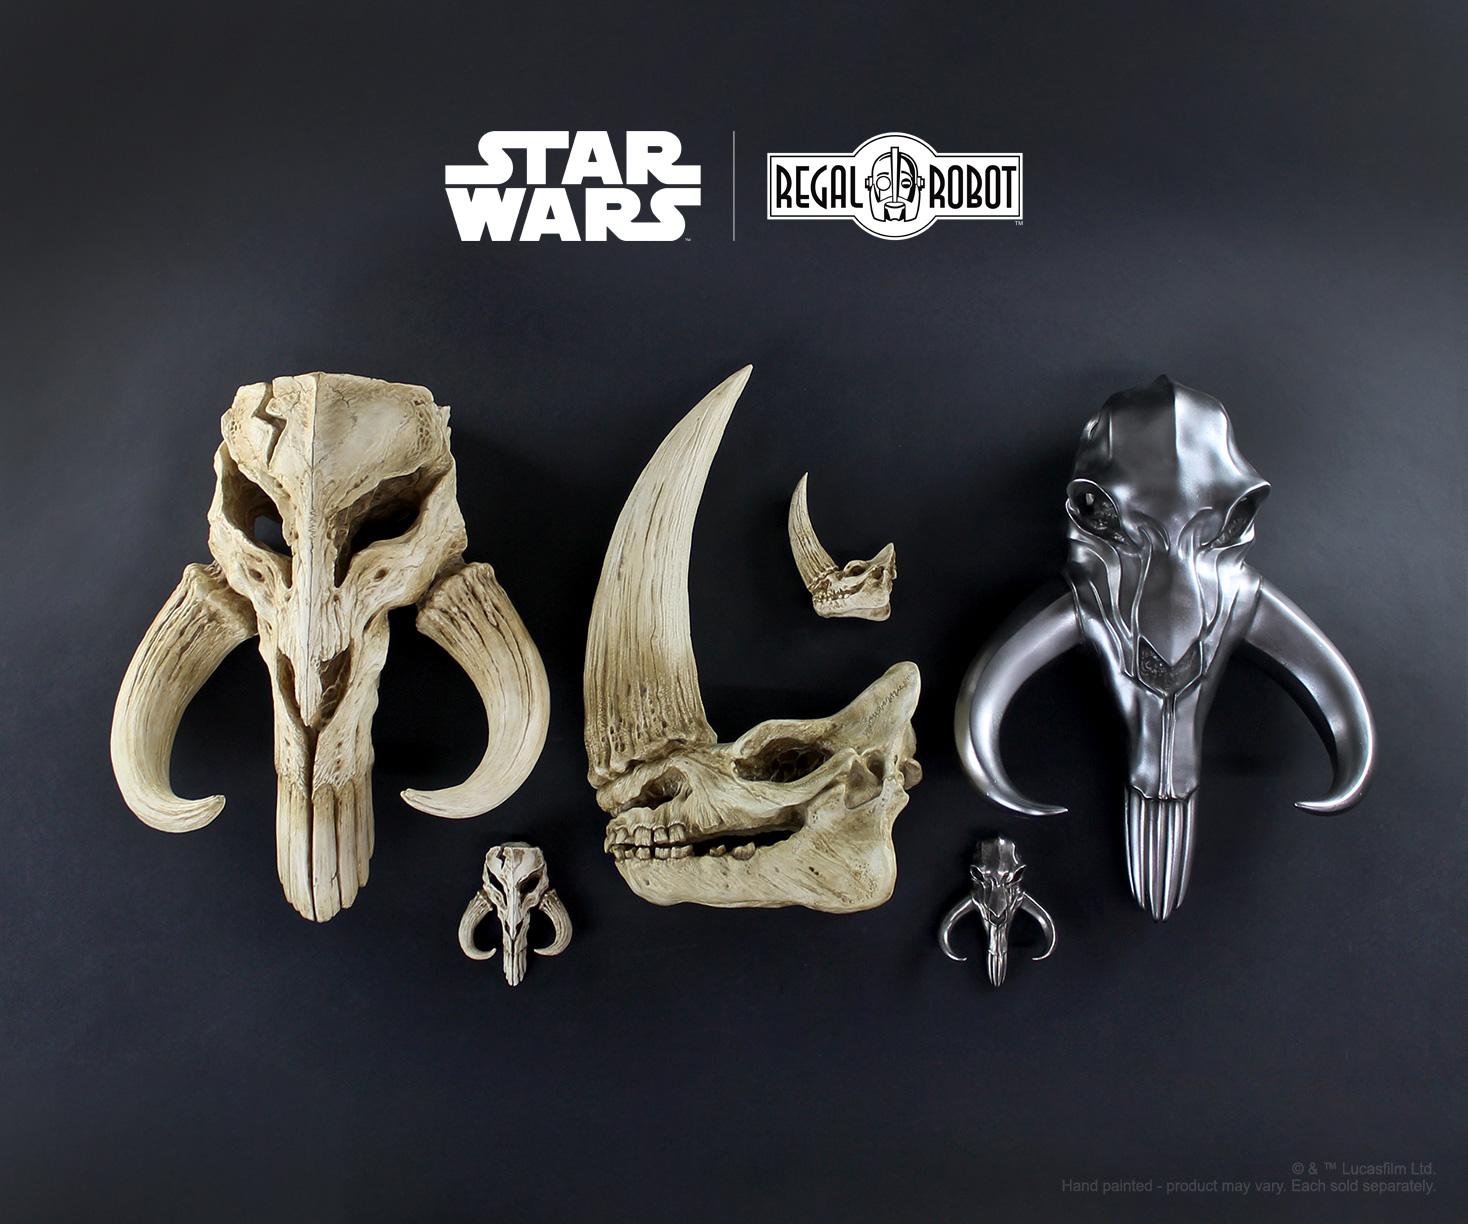 Regal Robot Star Wars Mandalorian skulls and decor